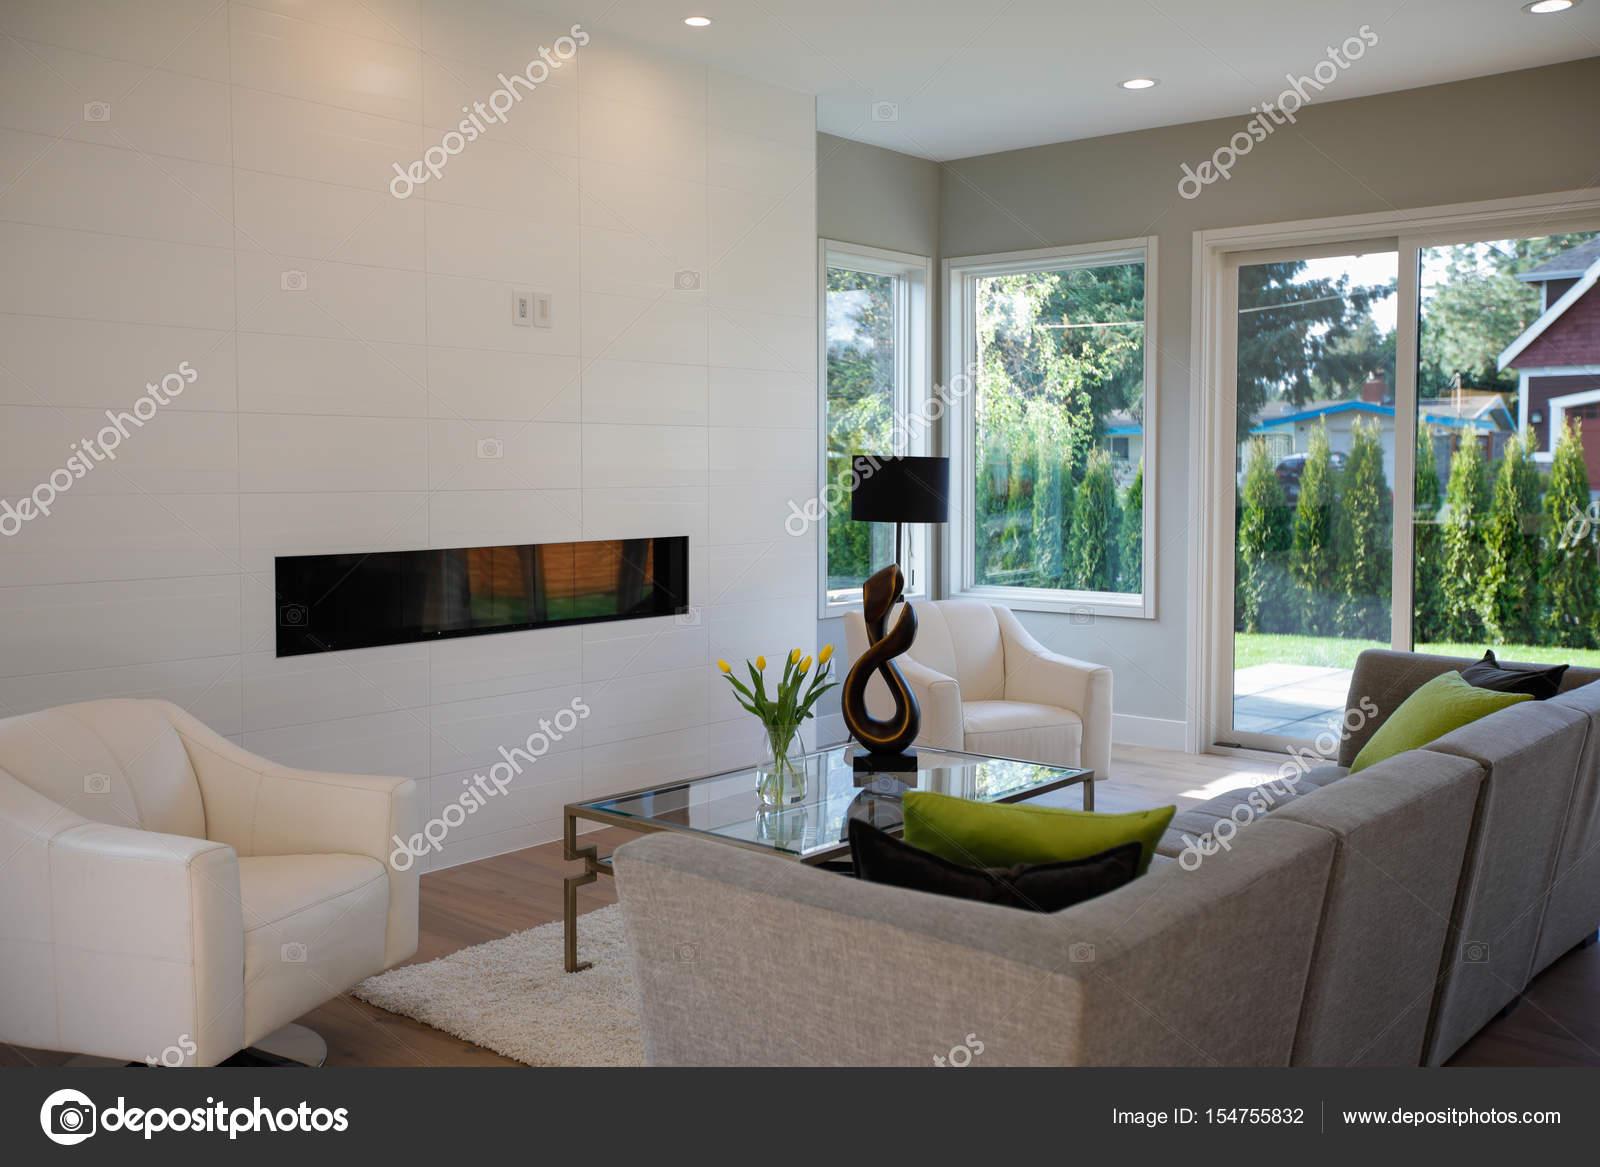 depositphotos_154755832-stockafbeelding-hedendaagse-stijl-woonkamer